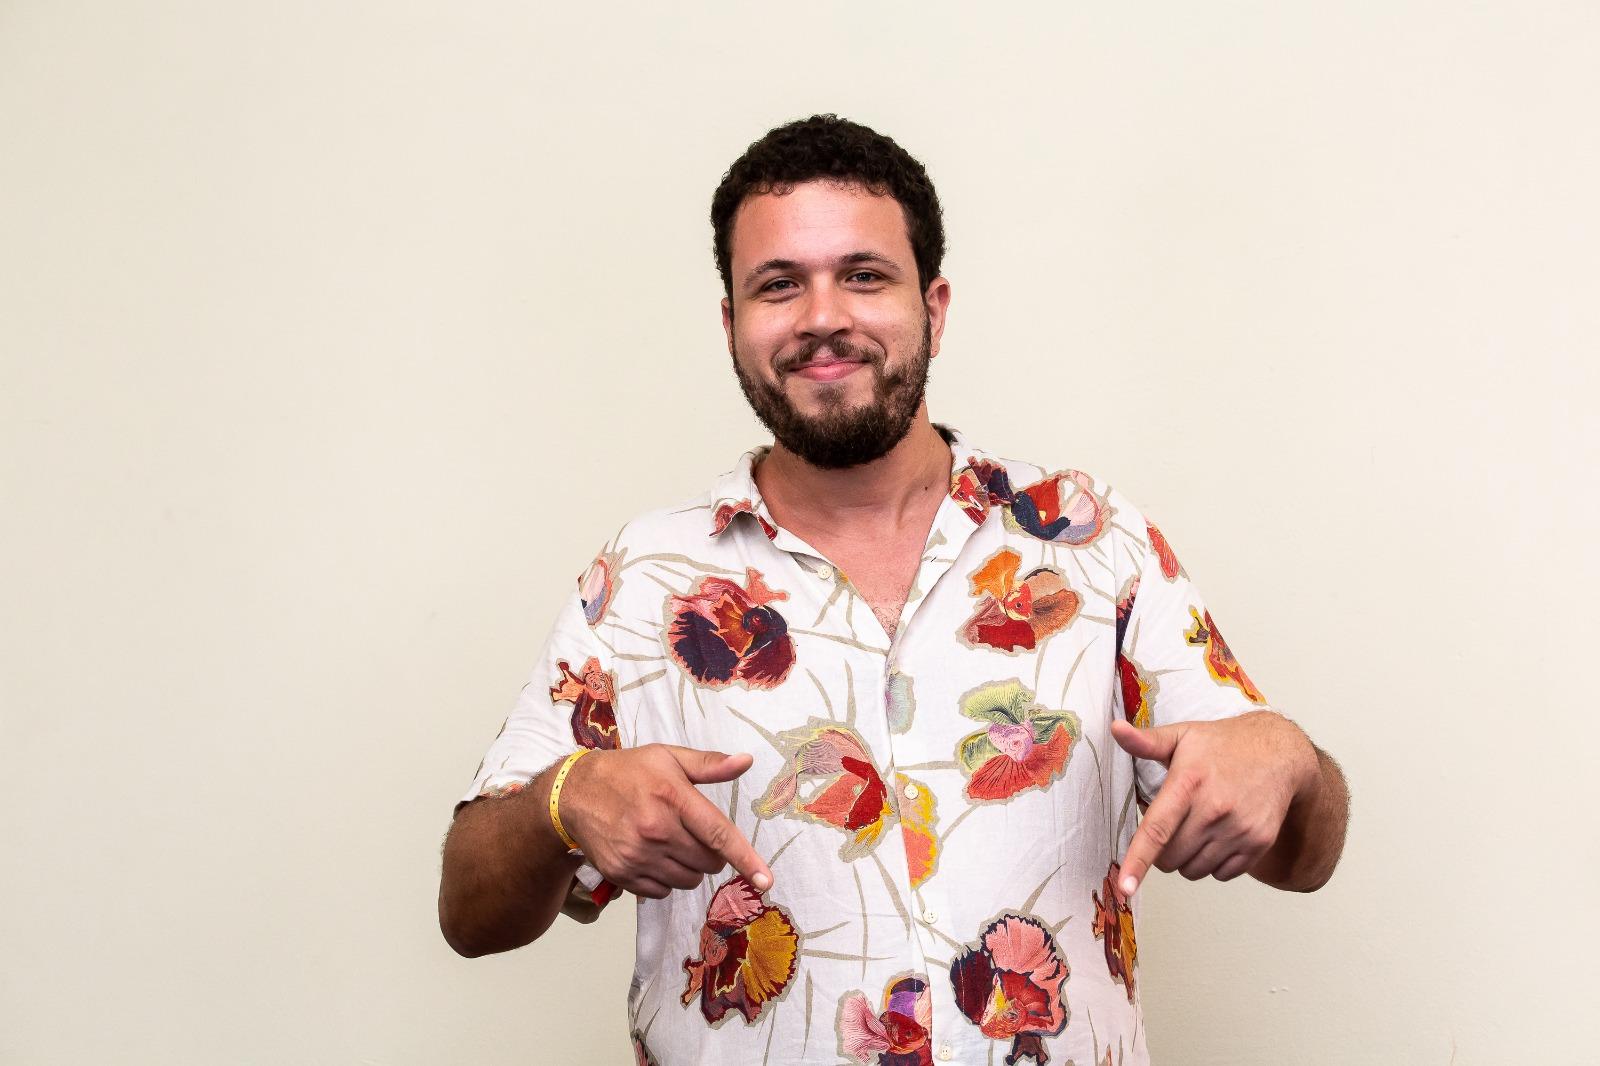 Luiz De Melo 2